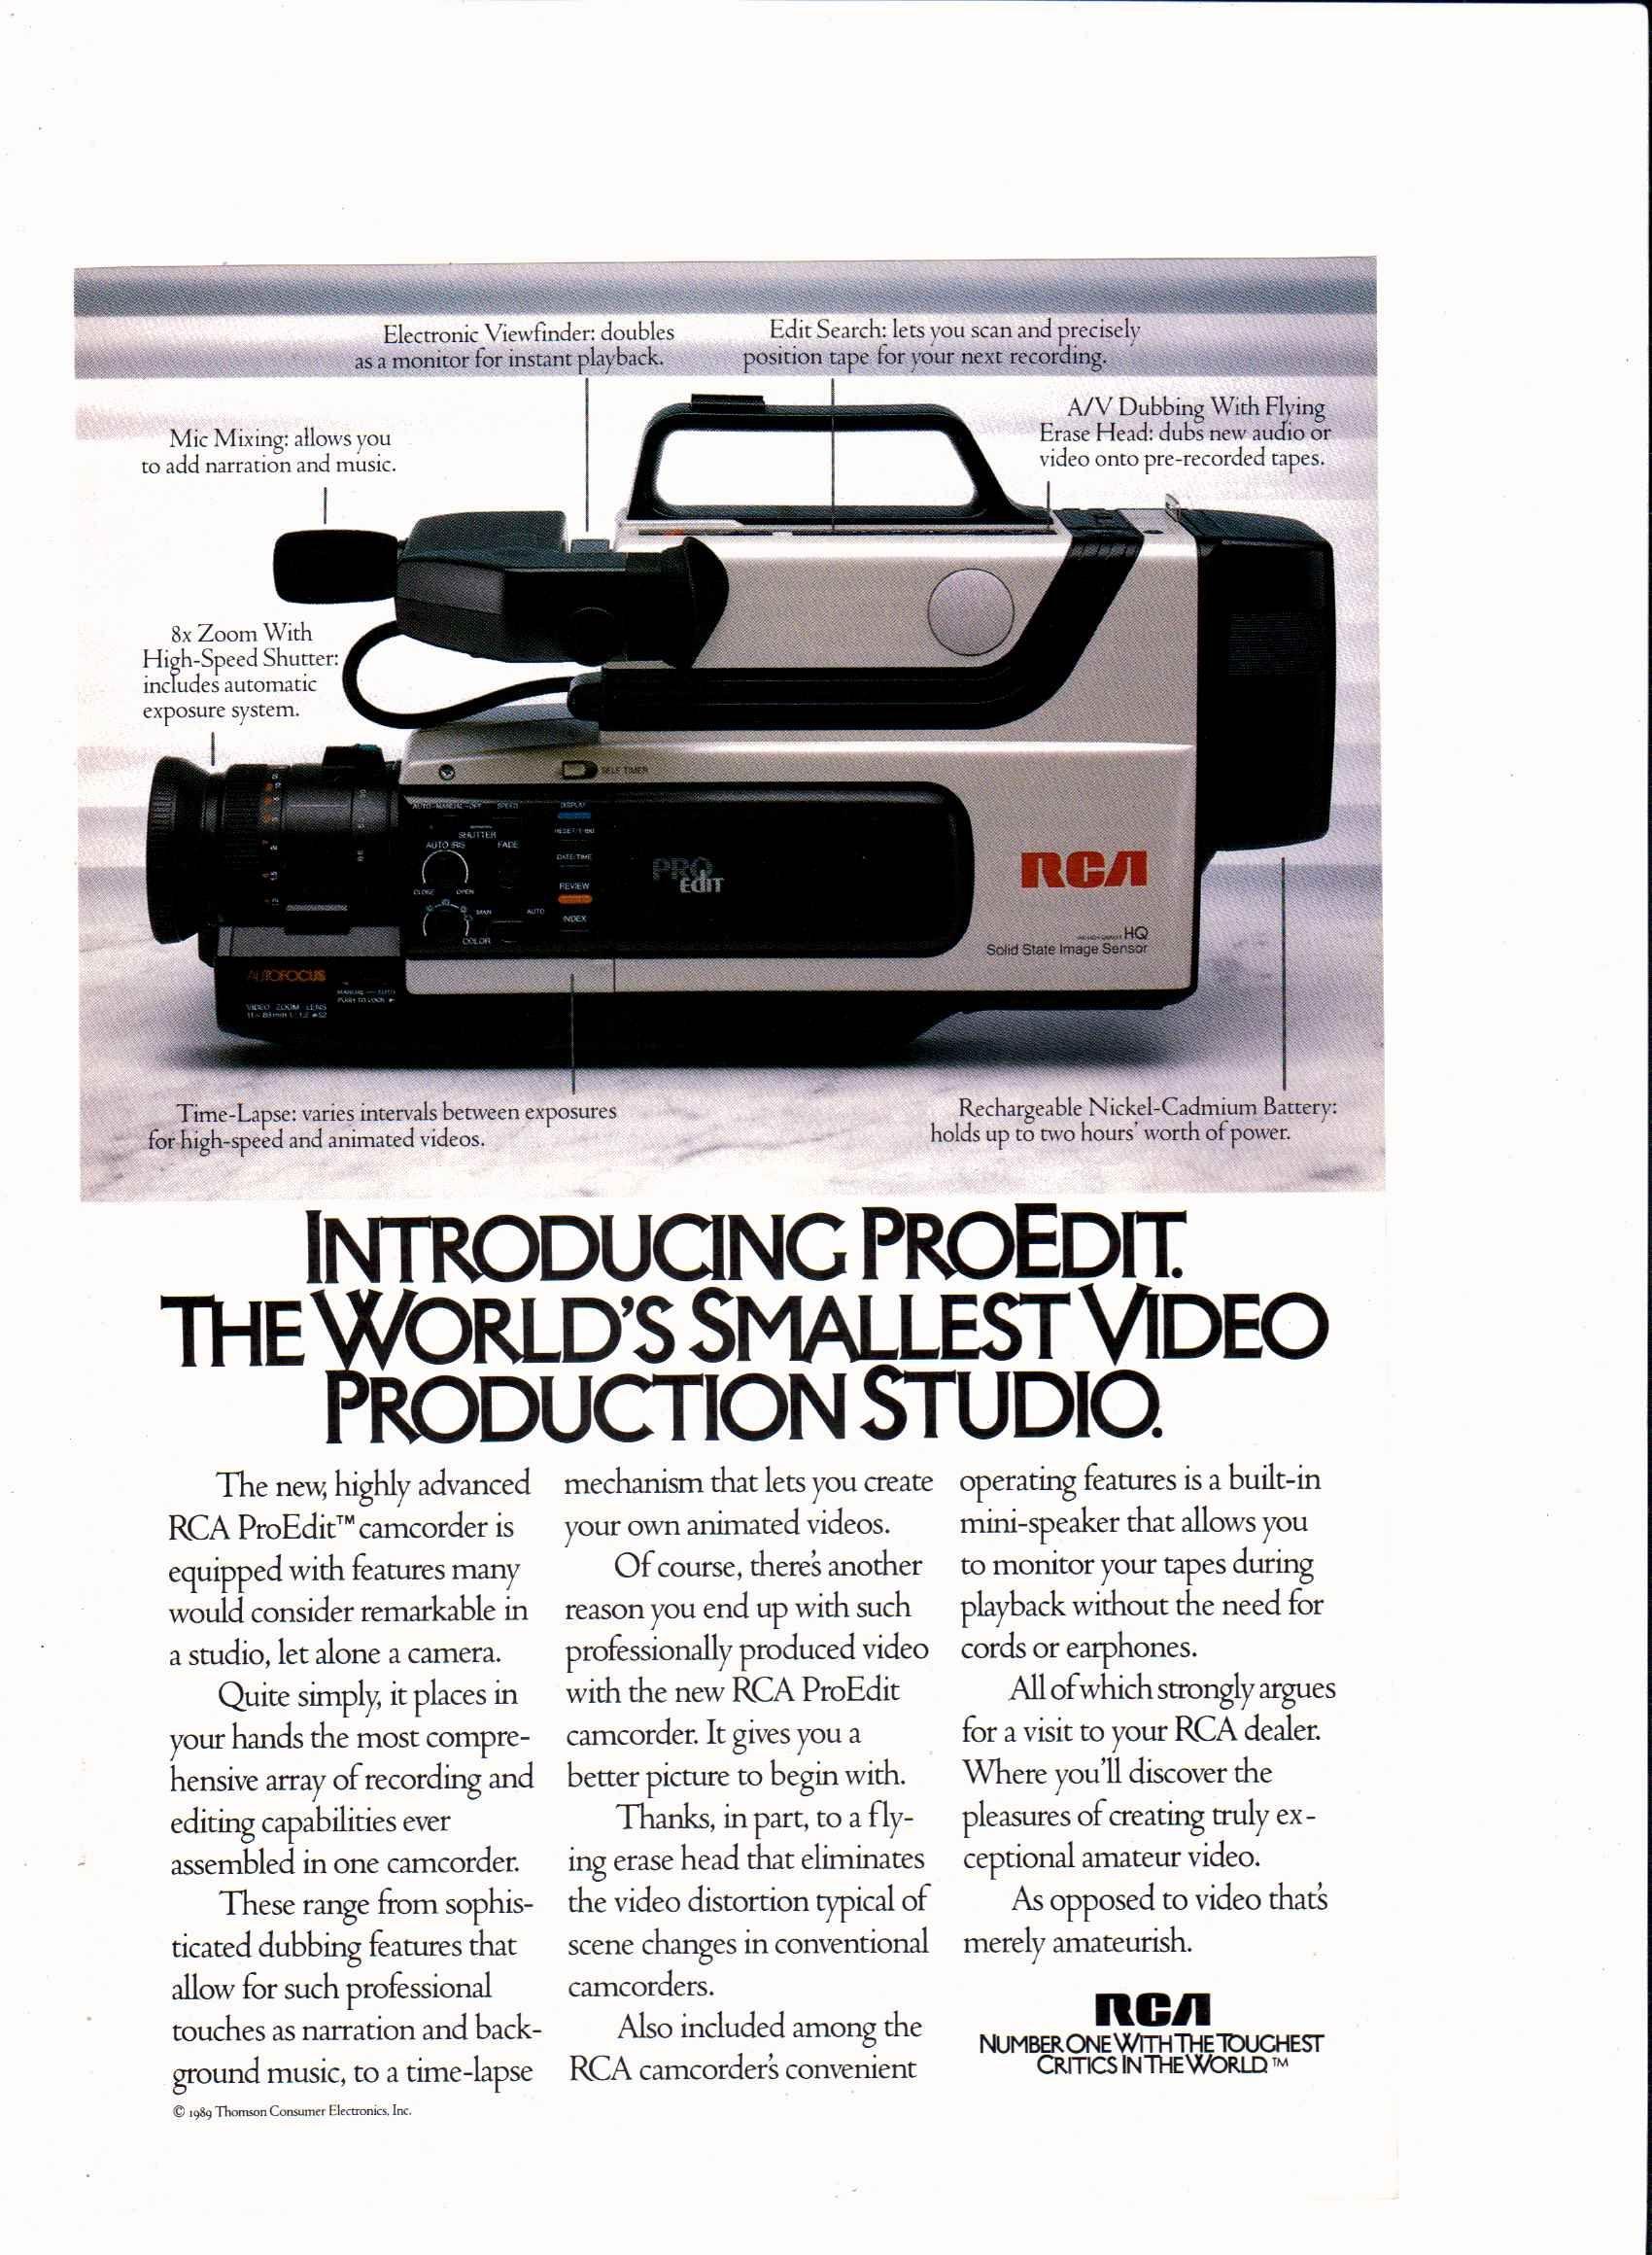 1989 Rca Proedit Camcorder Ad National Geographic December 1989 Ads Vintage Ads Television Network